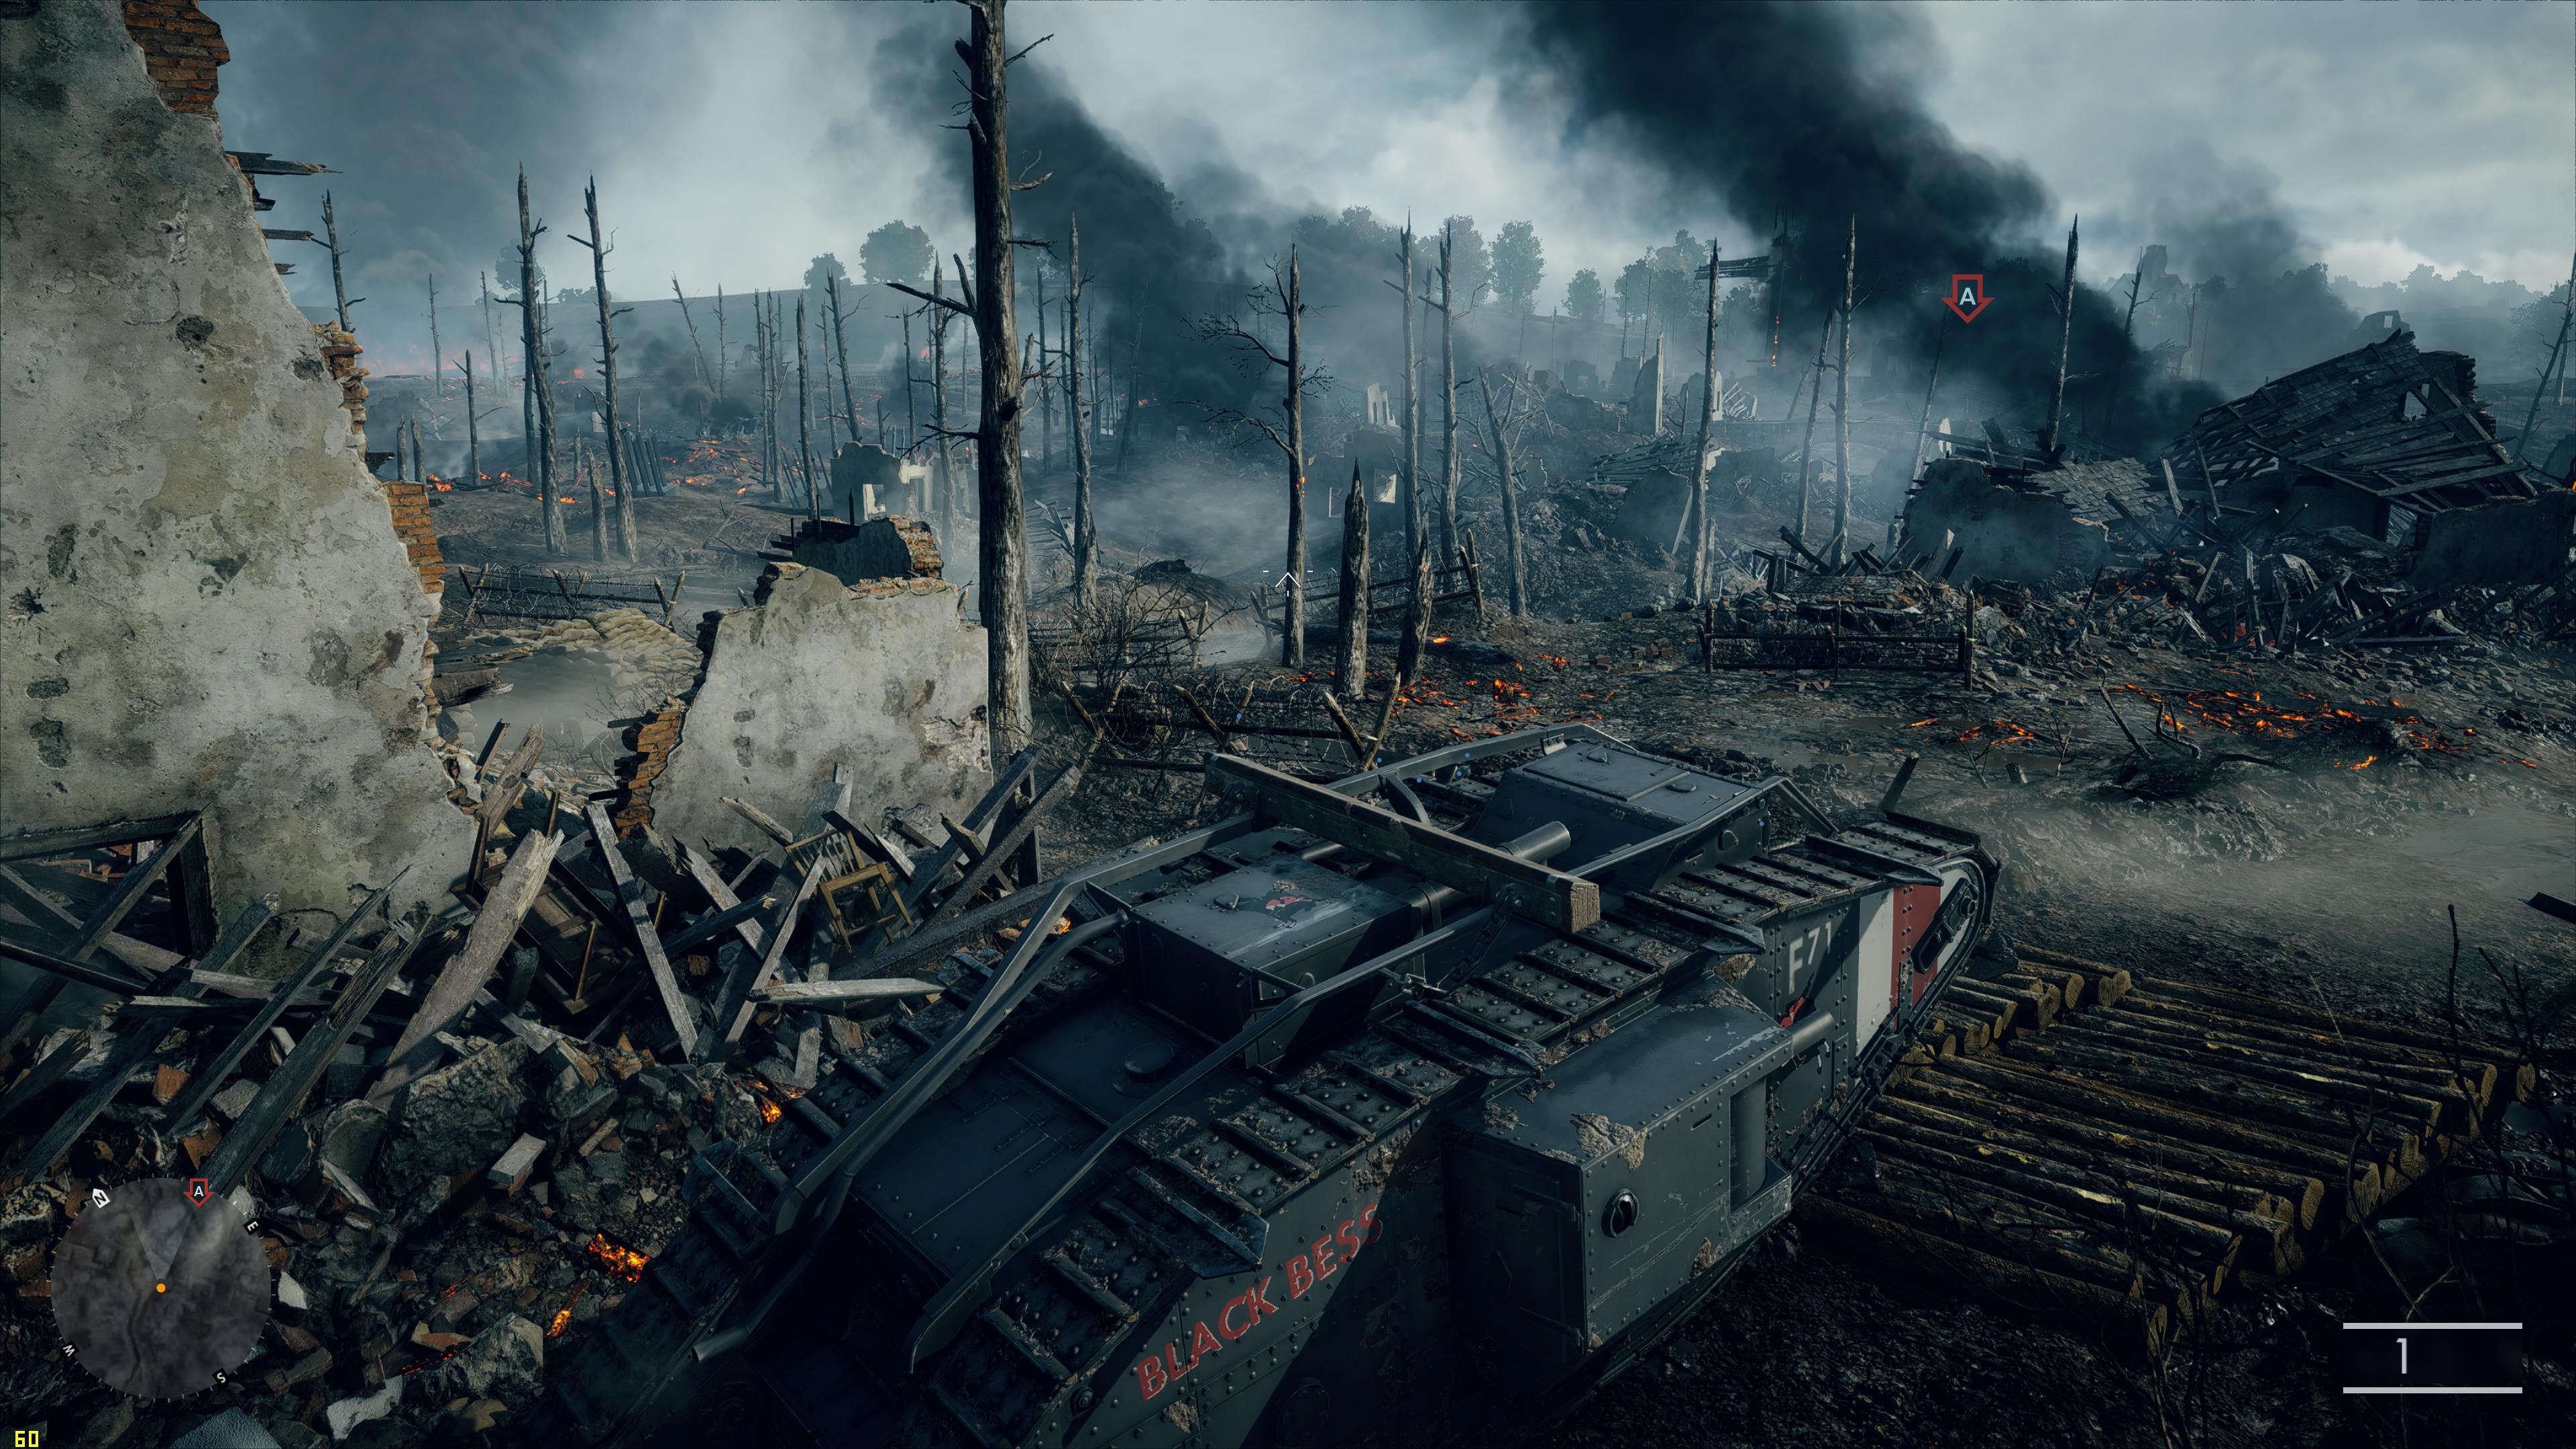 battle field ตัวอย่างใหม่ multiplayer battlefield 5 เกมยิง fps ใหม่ล่าสุด มีภาพมาให้ดูเพิ่มเตินต้อนรับงาน e3 ที่ los angeles, claifornia.